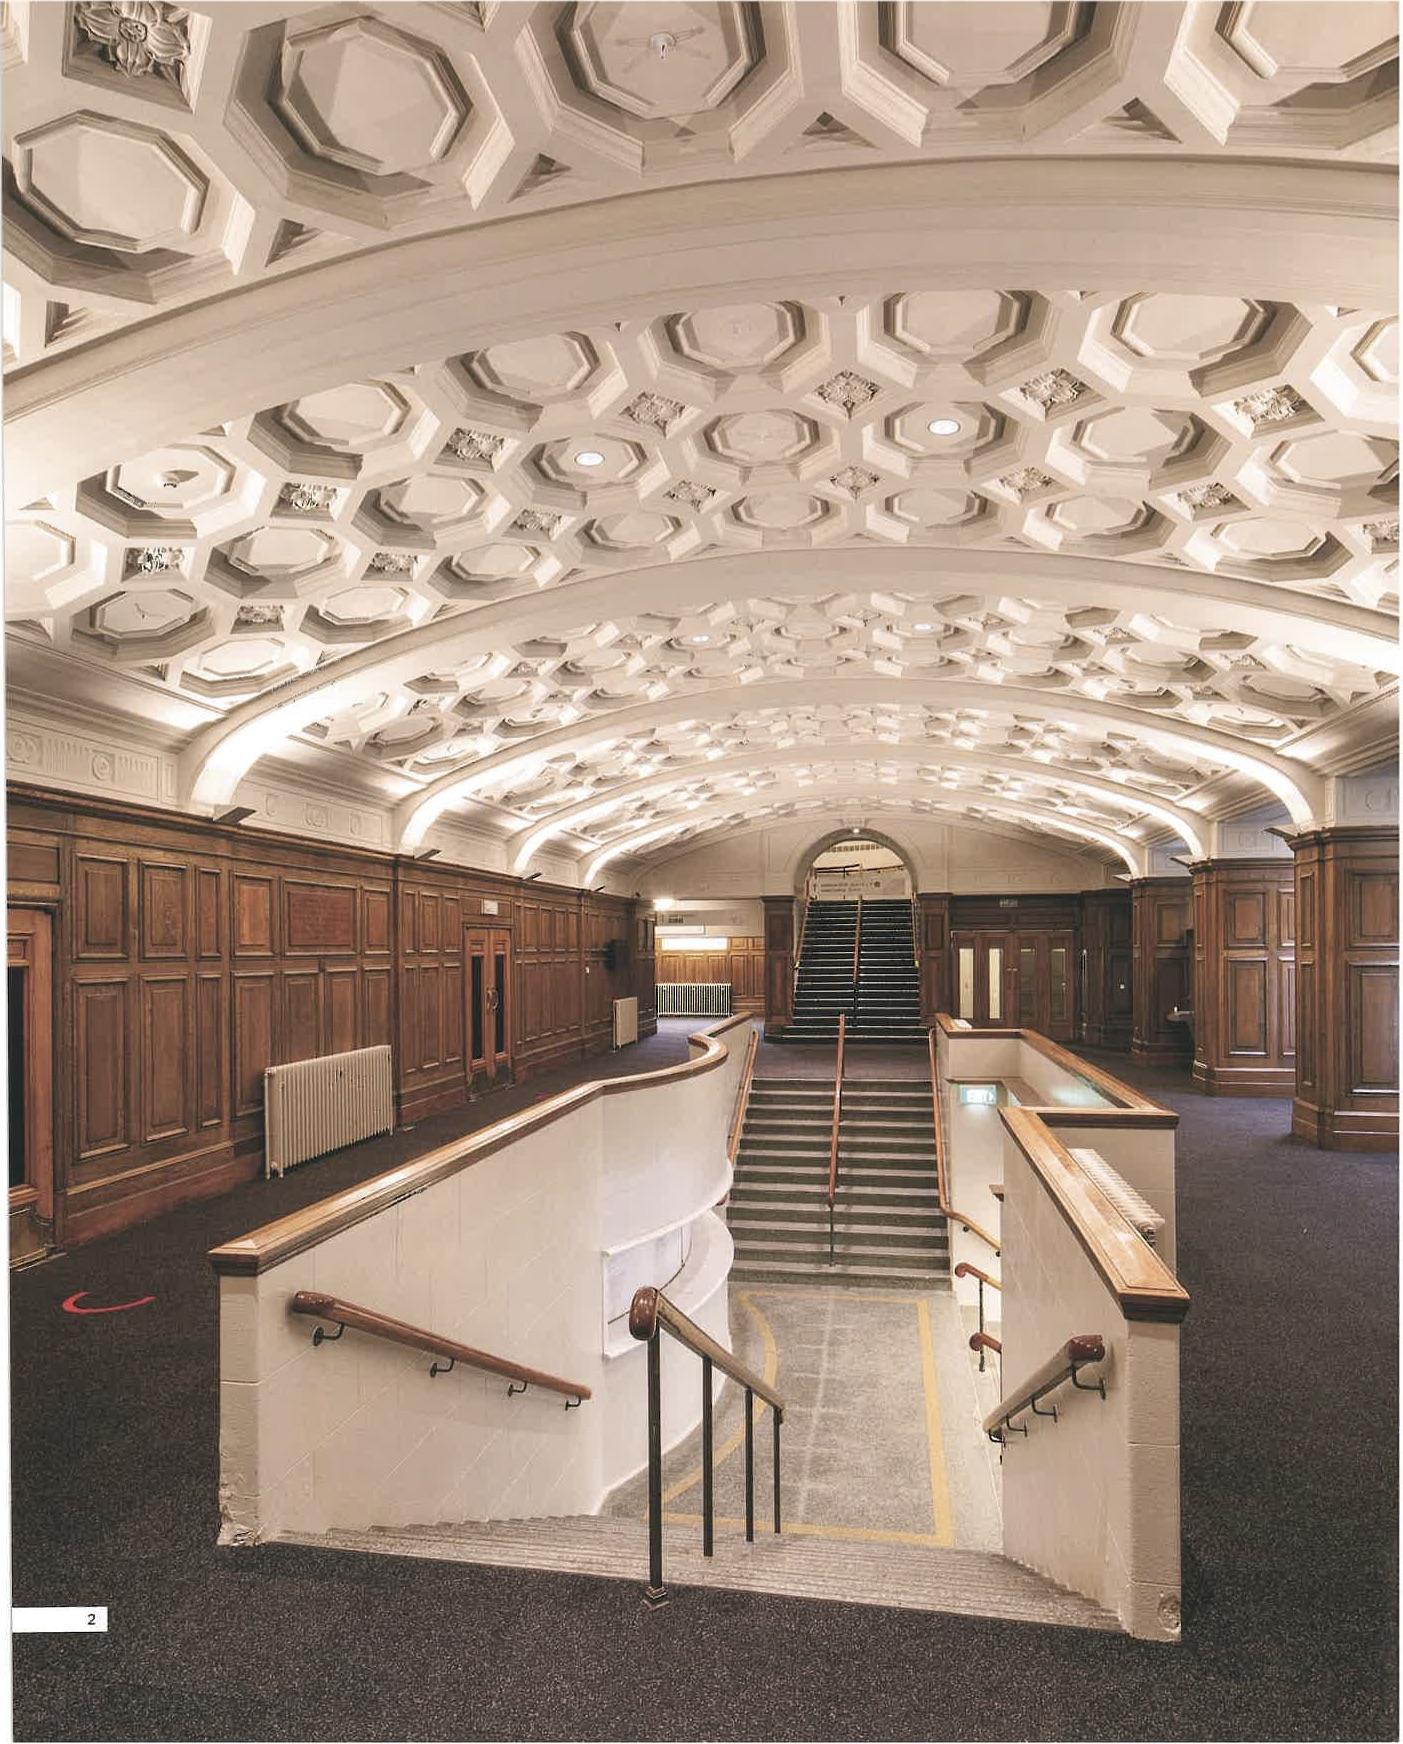 Dunedin Town Hall - Interiors Article Dec - Feb 2014 - 2015_3.jpg